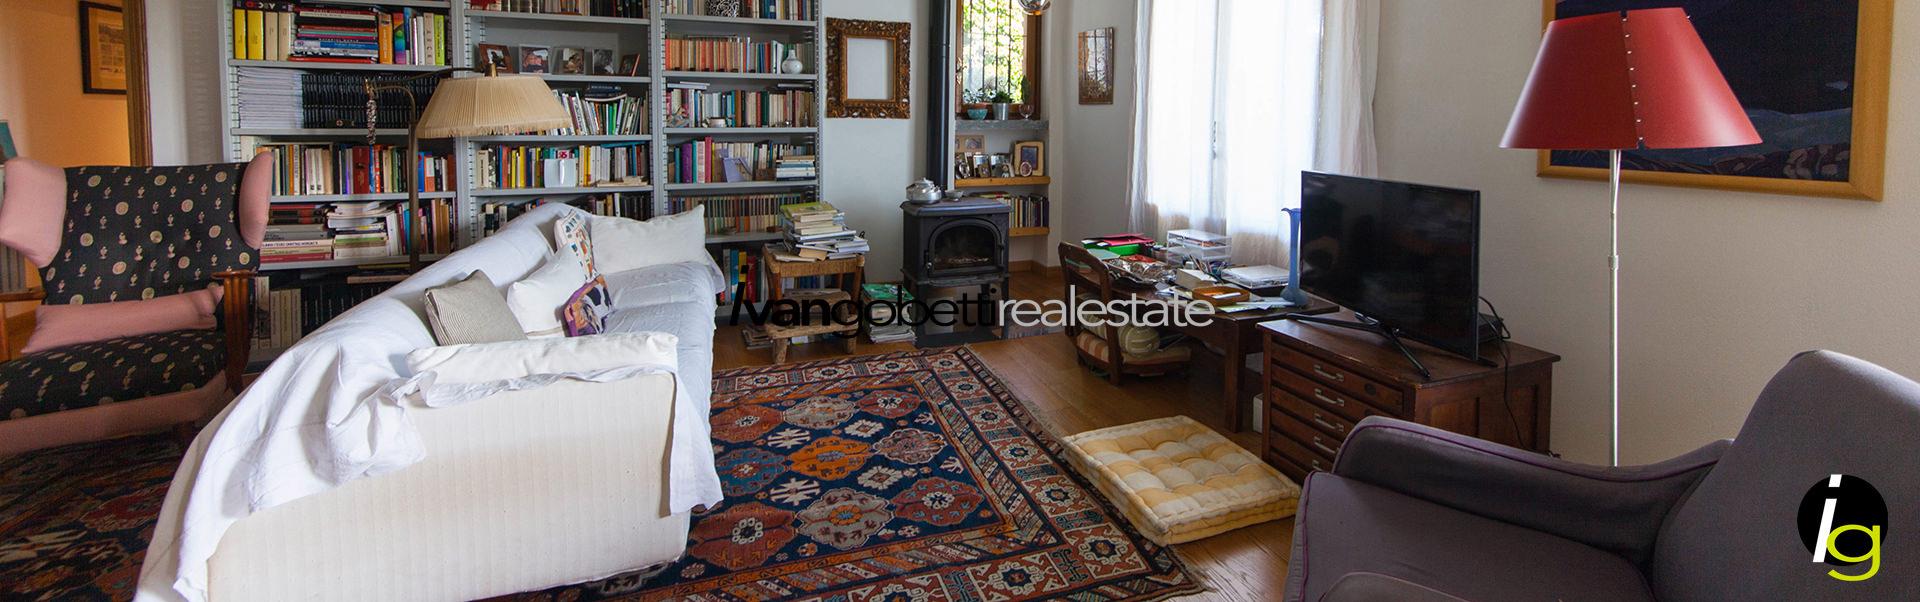 For sale stone villa with a panoramic view of Lake Maggiore, Verbania